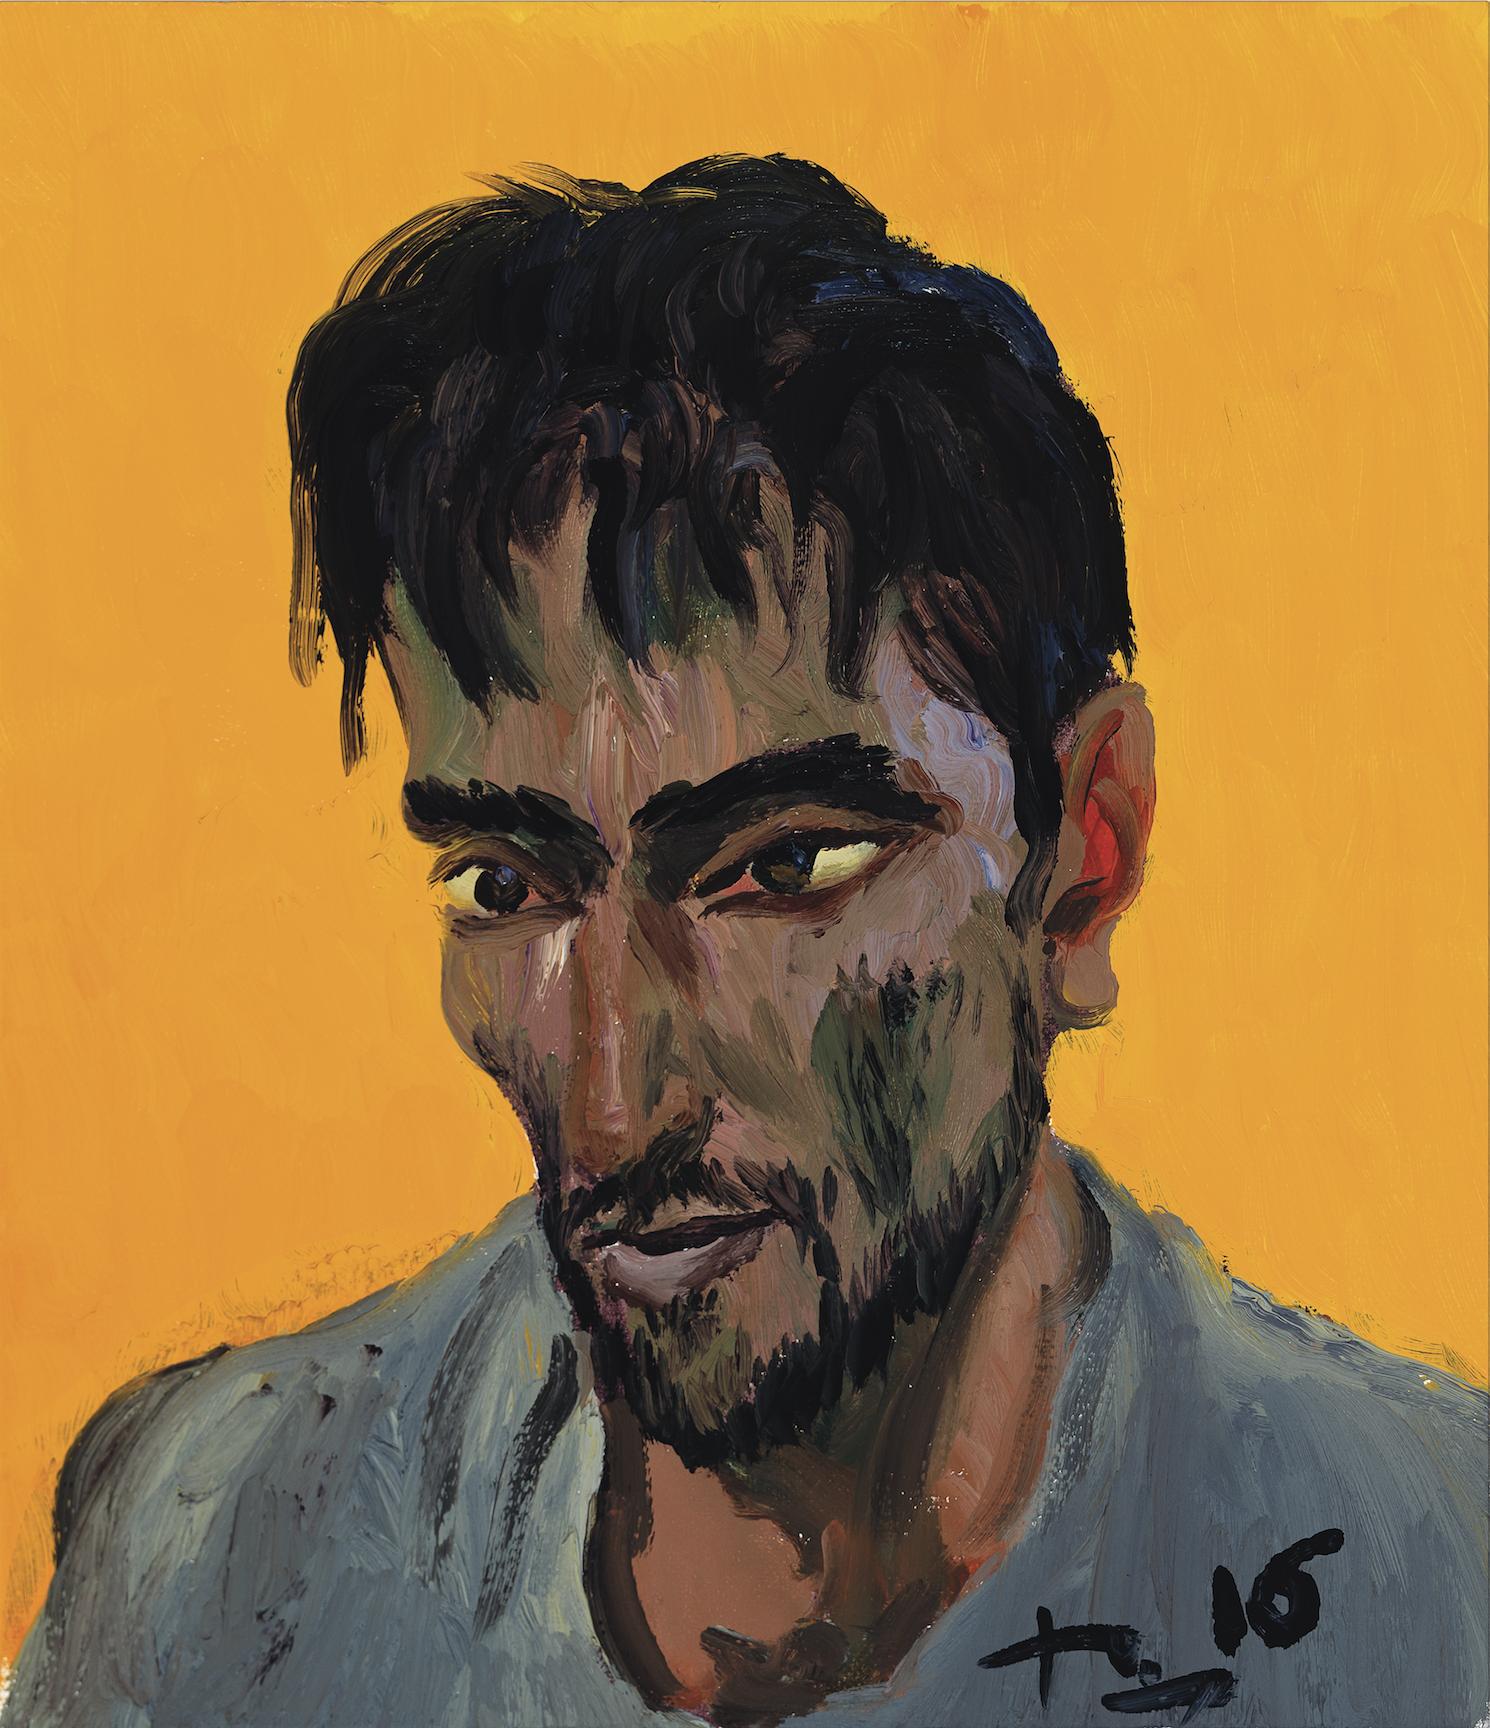 难民8Refugees 8 刘小东 Liu Xiaodong 布面油画 Oil on Canvas 38×33cm.png